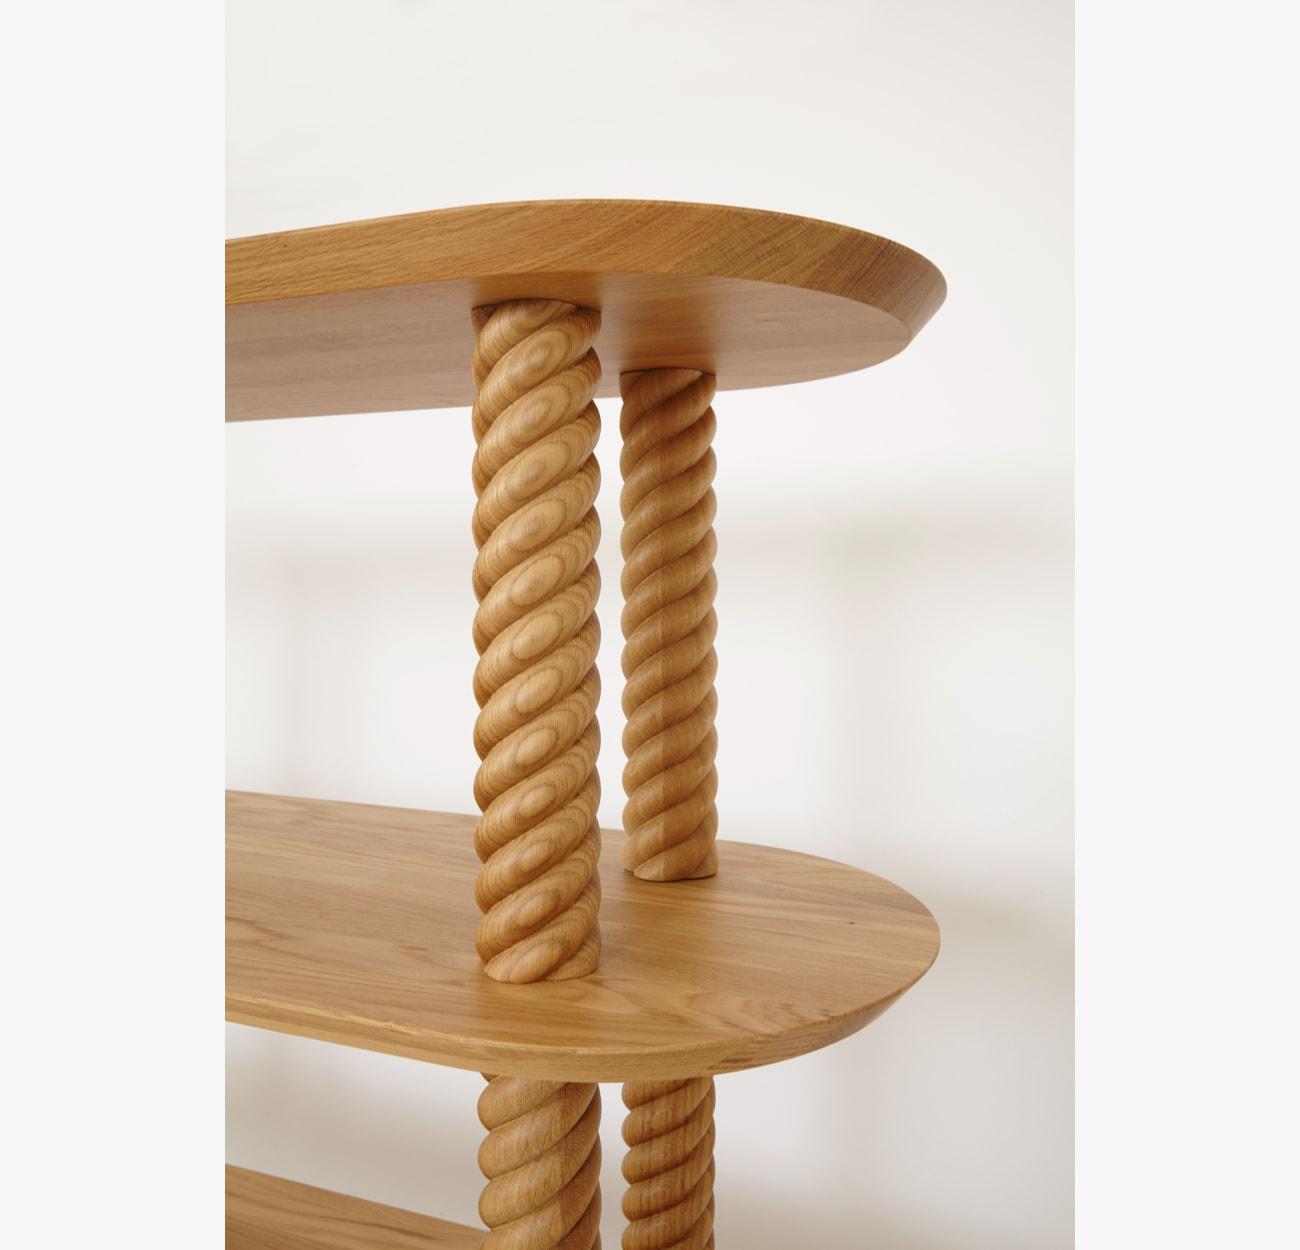 furniture-remix-rope-shelf-the-hansen-family-5